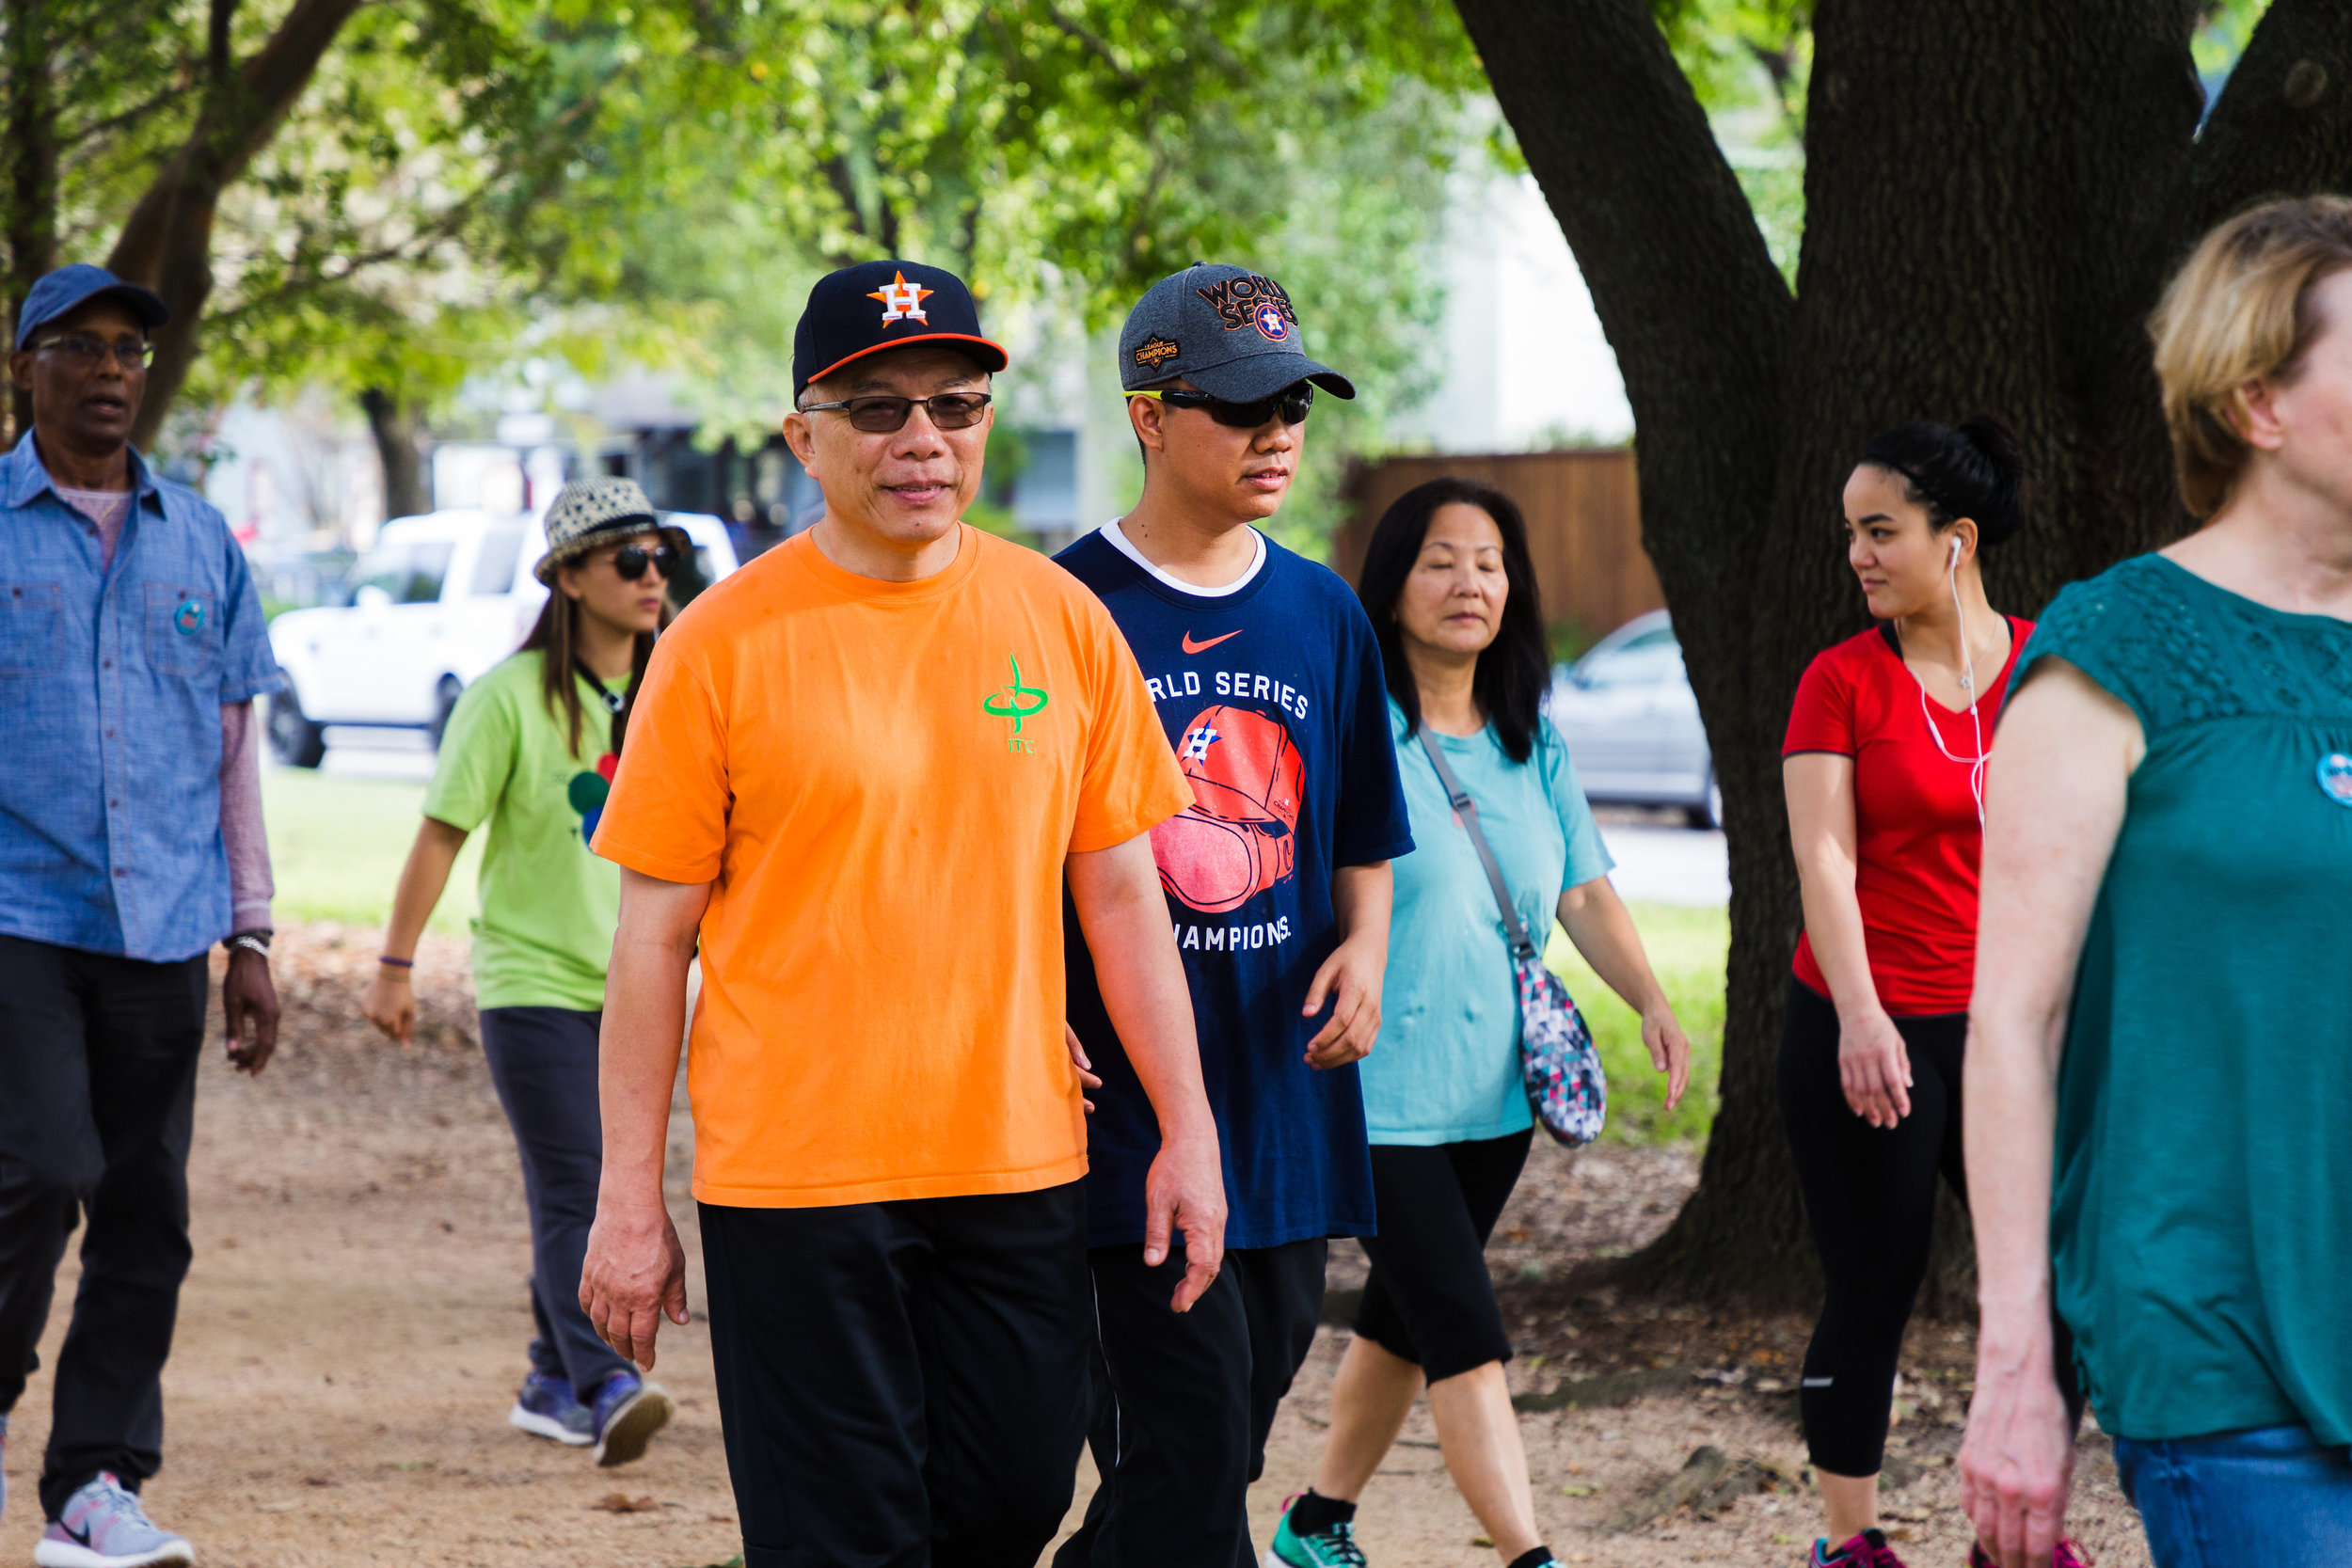 Bhikkhu-Bodhi-Global-Relief-Houston-Zen-Walk-64.jpg